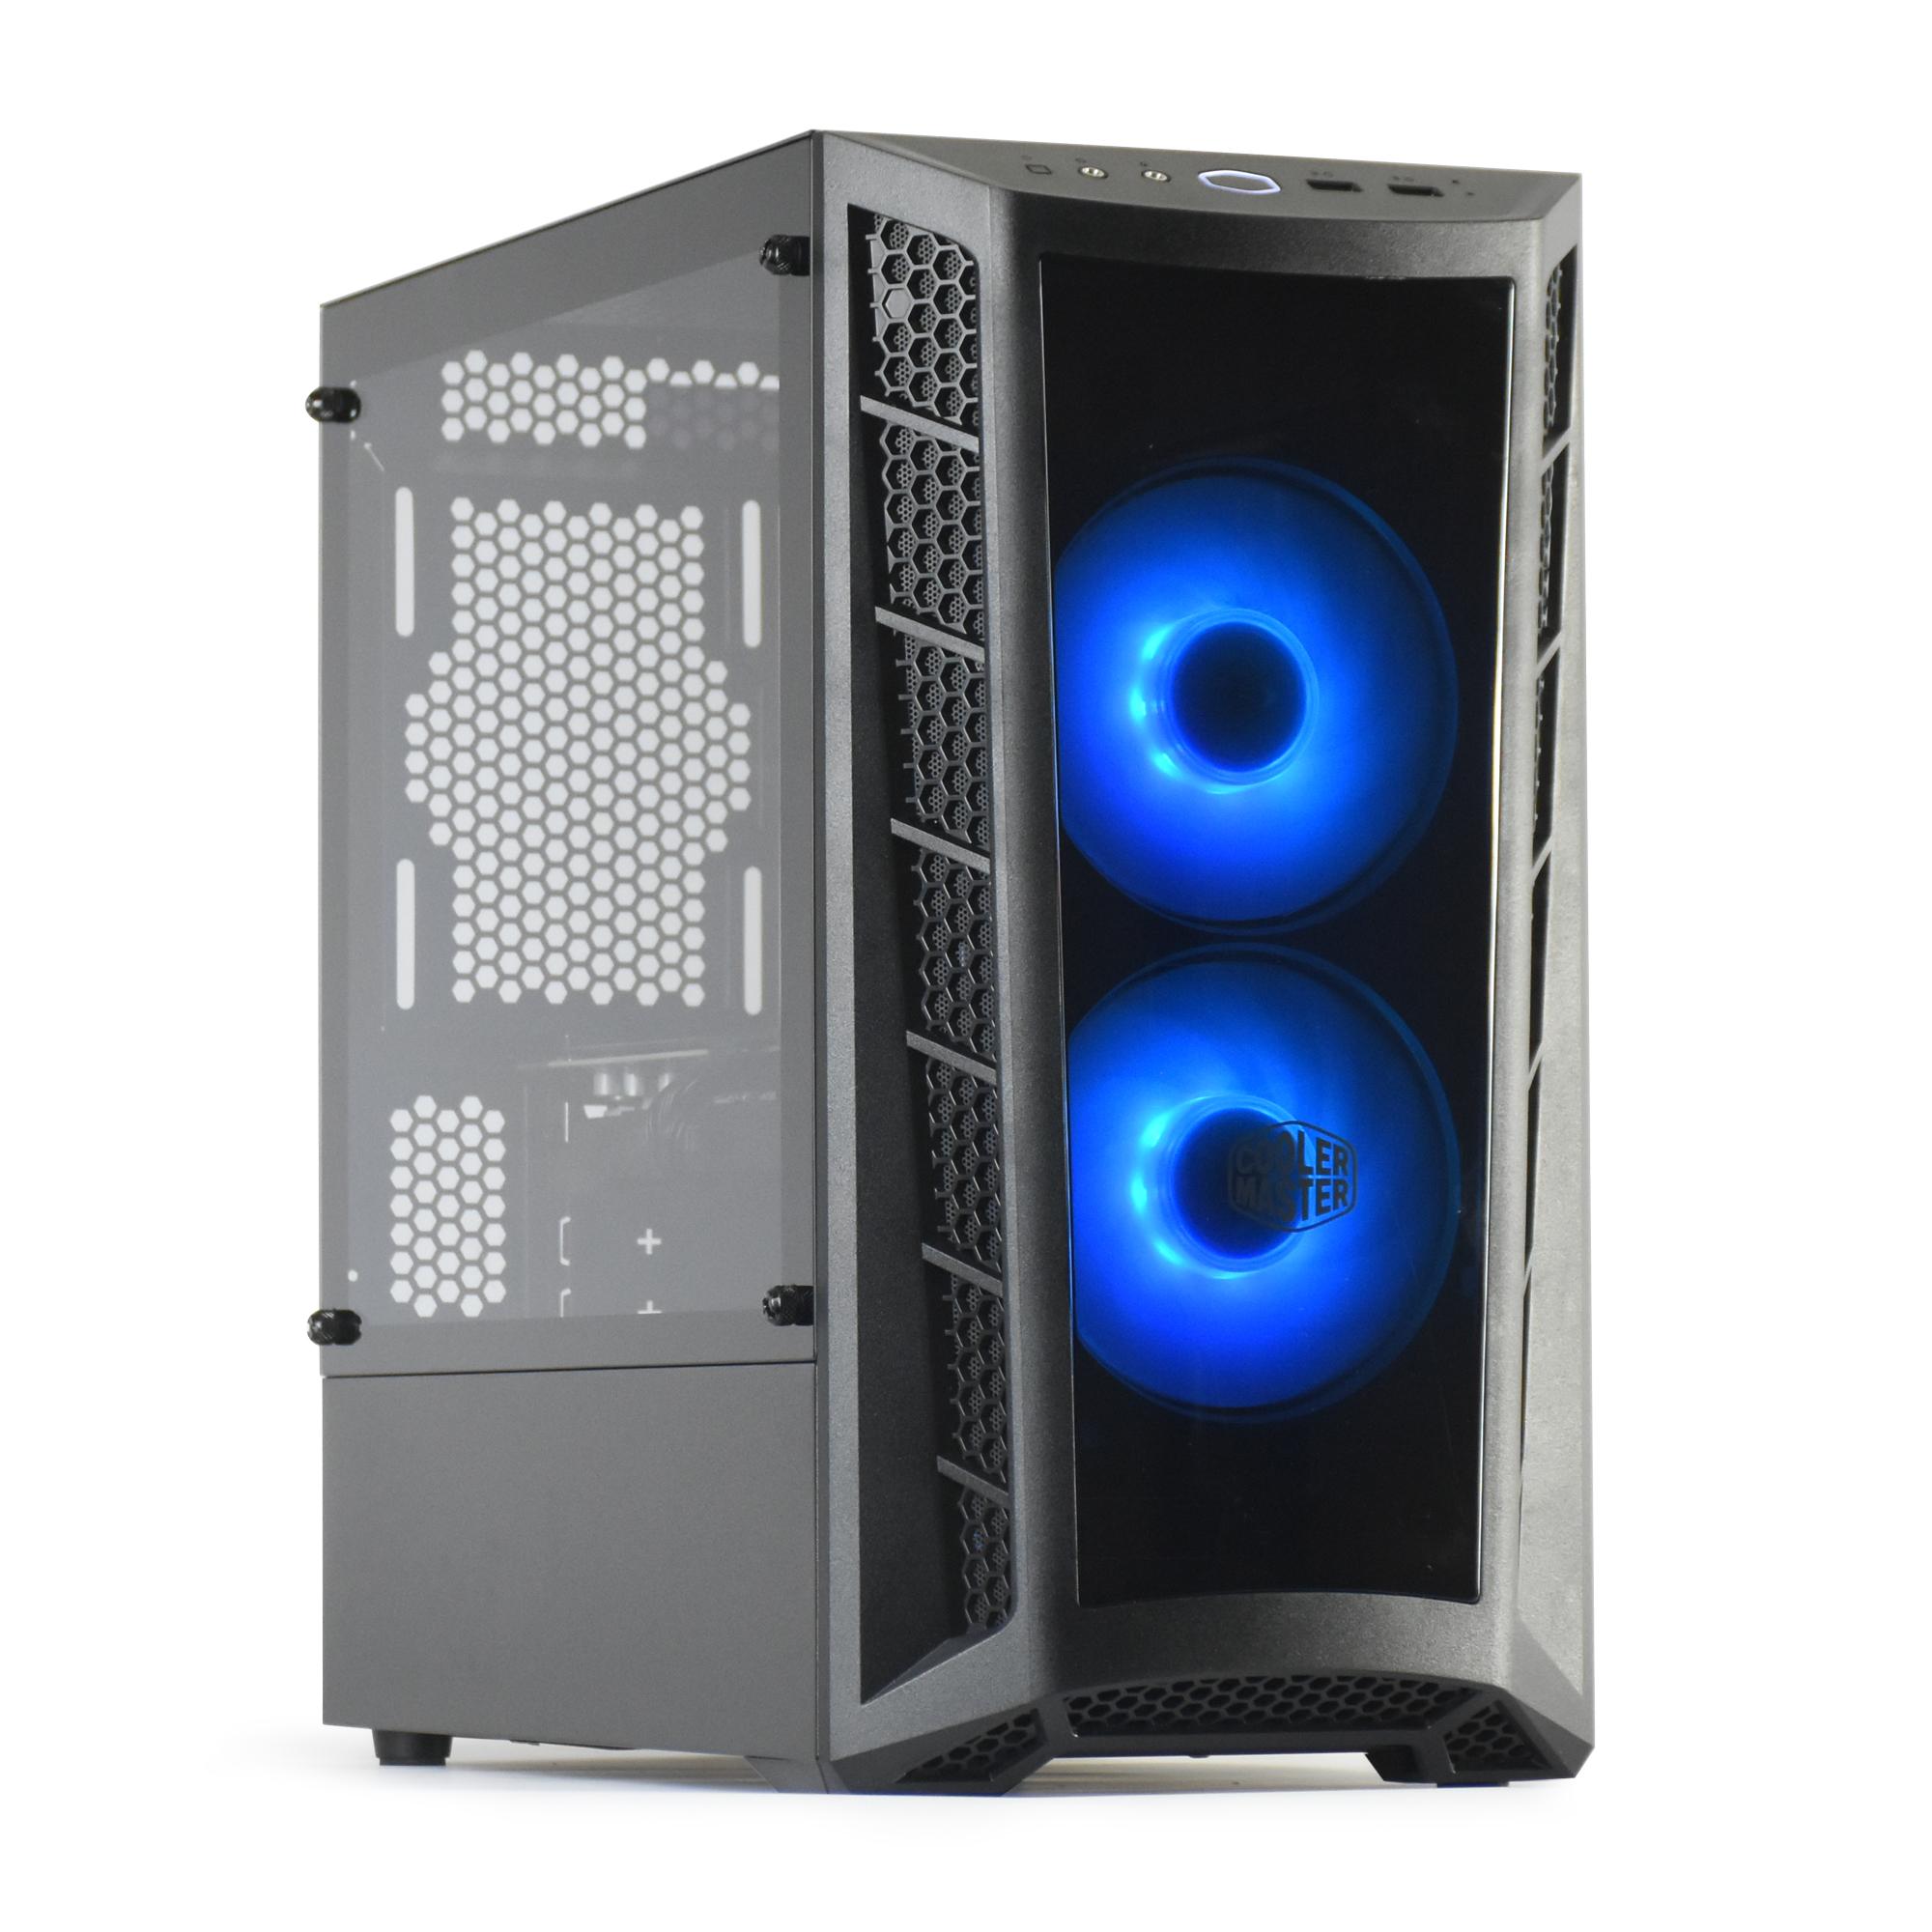 Umart G5 Ryzen 5 3600 RTX 2060 Gaming PC